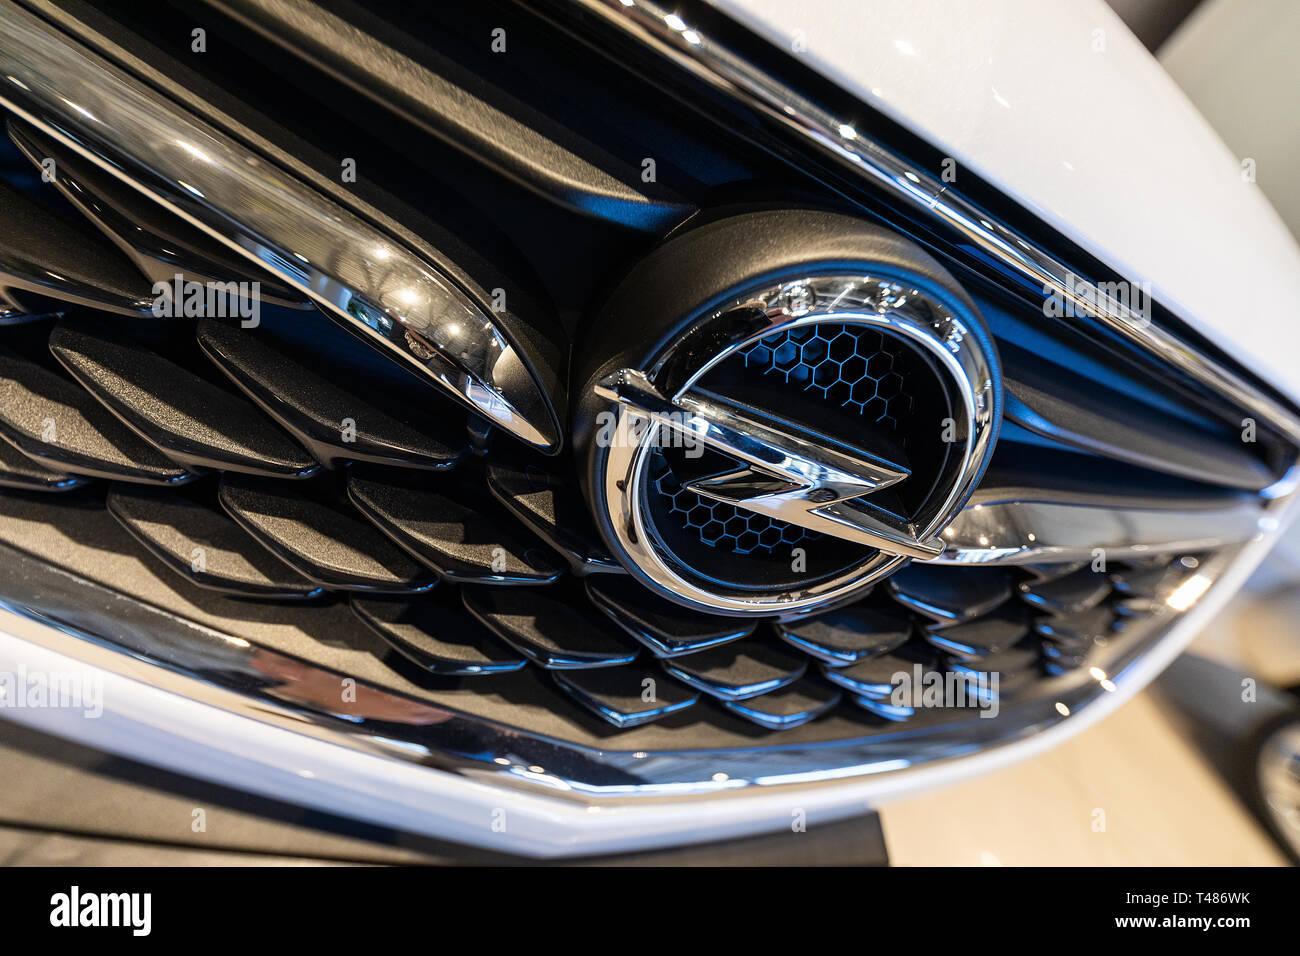 Minsk, Belarus - March 23, 2018: Opel classic car emblem - Stock Image